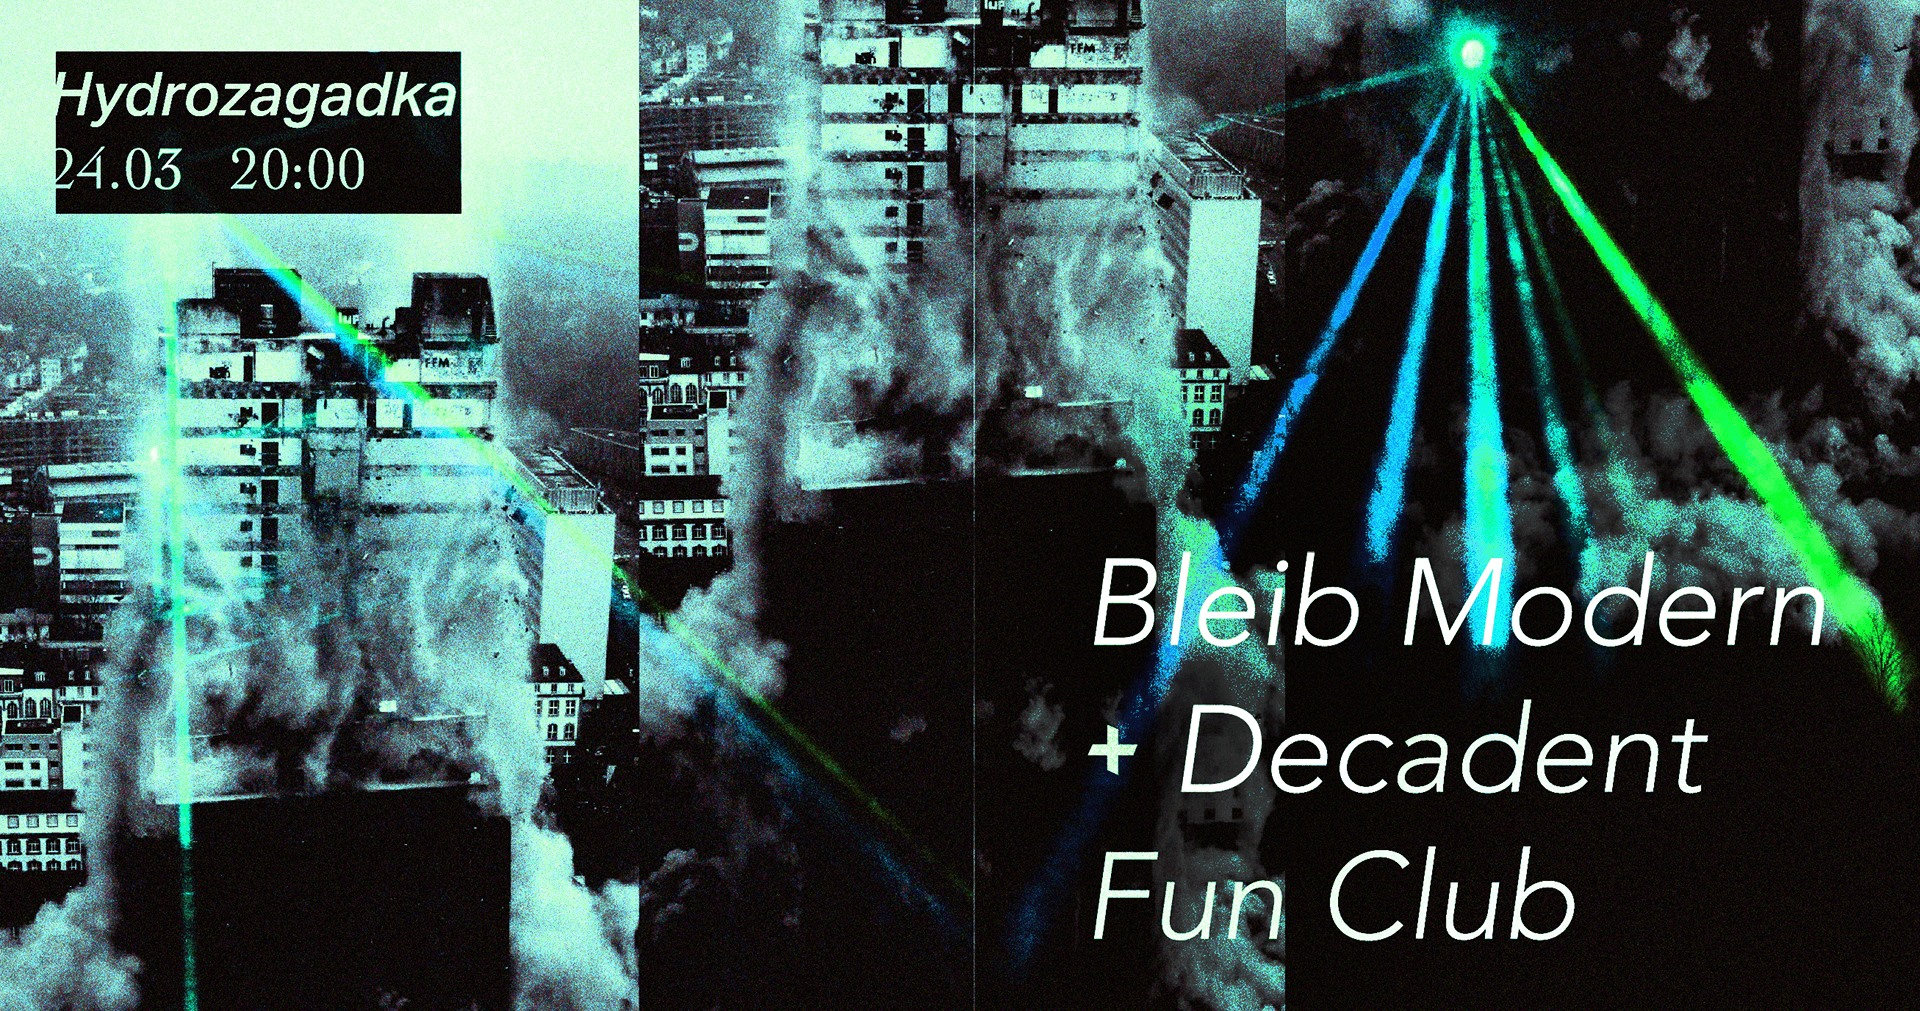 Bleib Modern - Decadent Fun Club (Hydrozagadka - Warszawa - 24.03.2018)